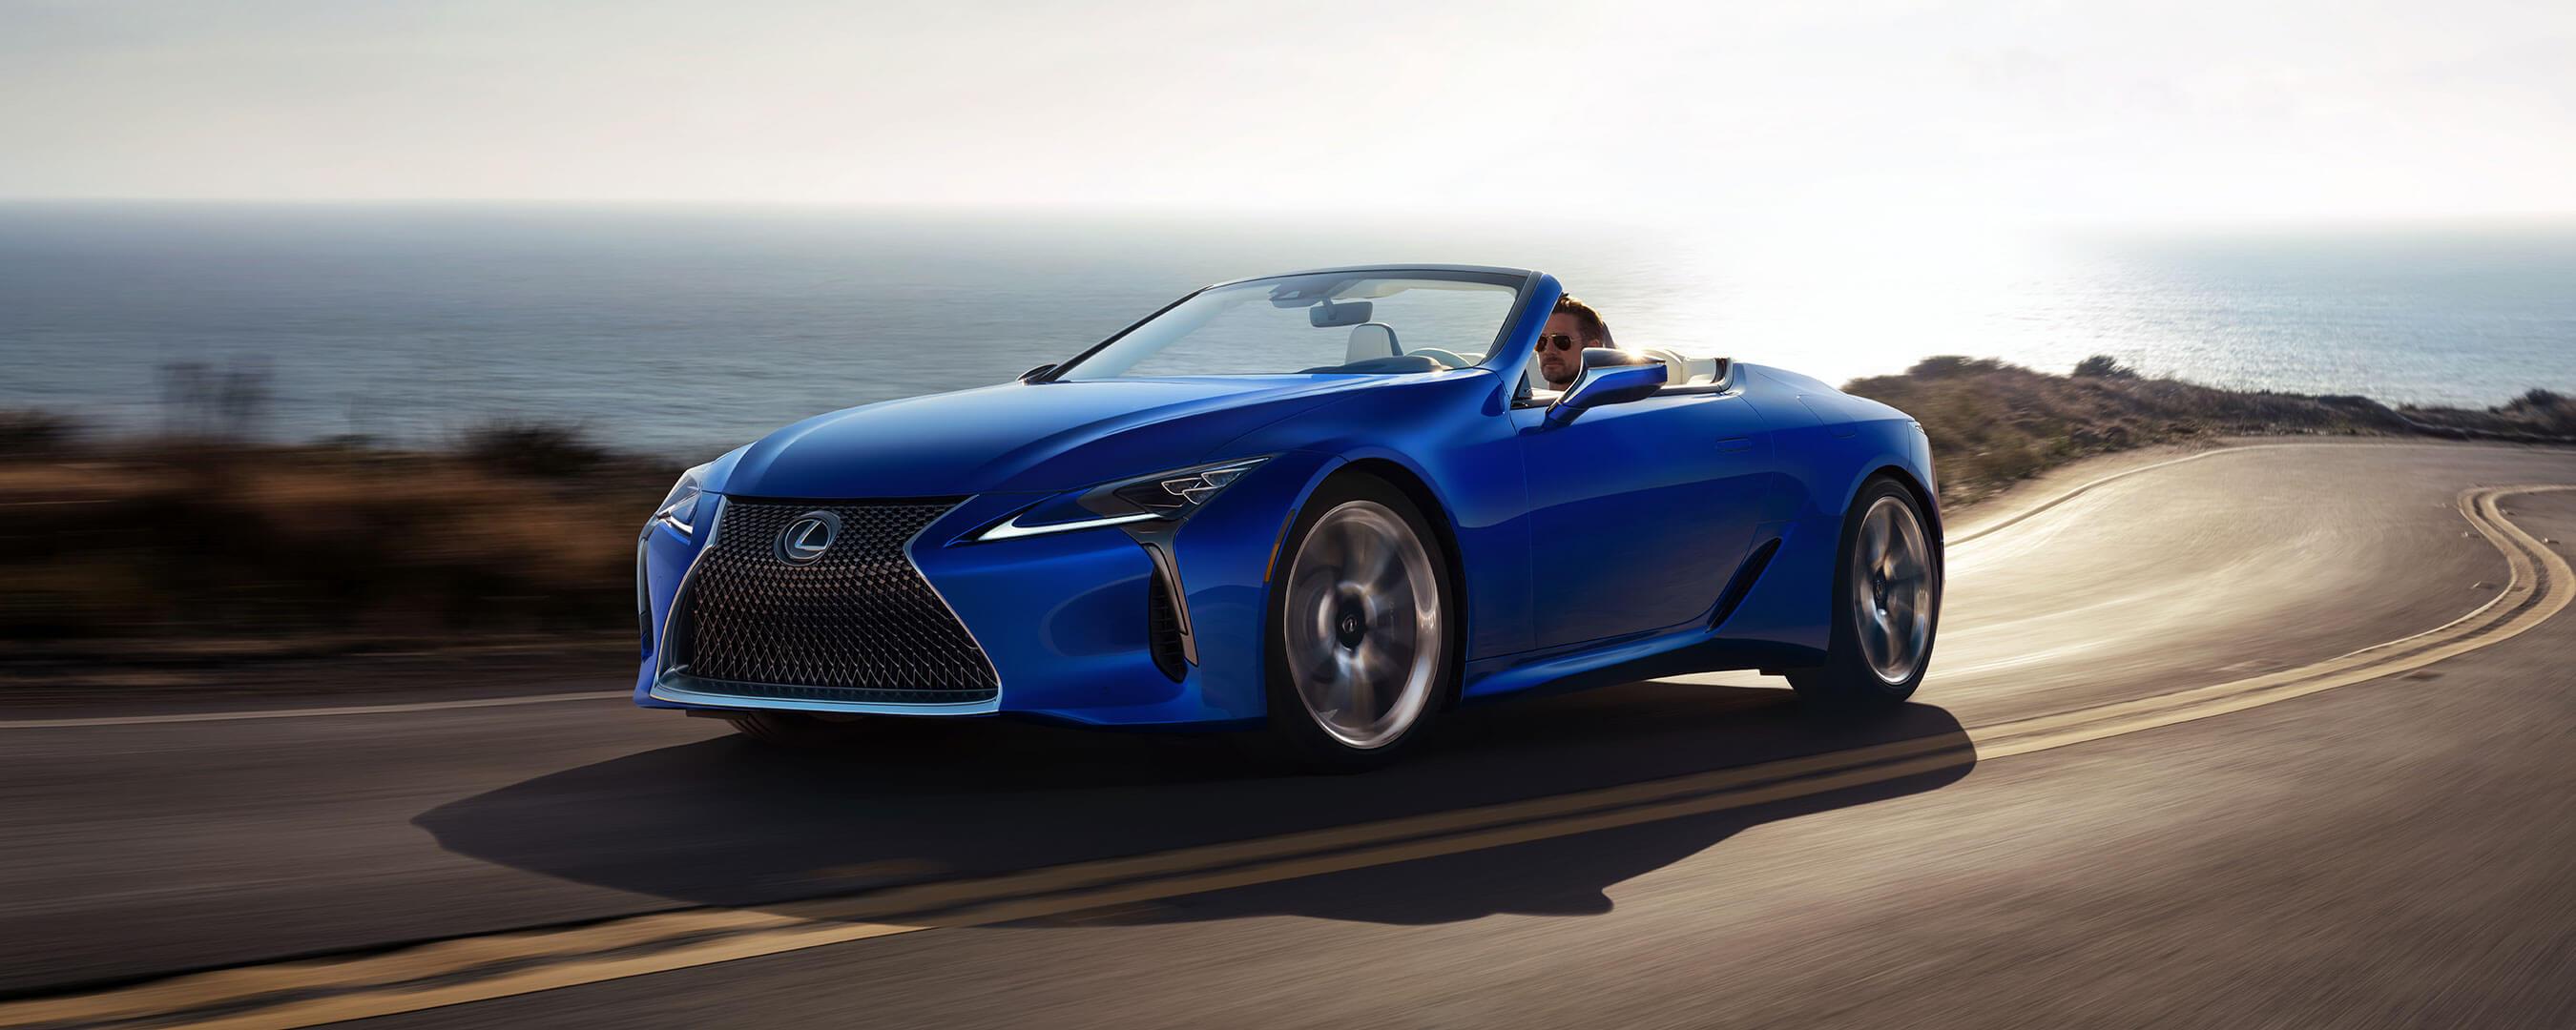 2020 lexus lc convertible experience exterior front